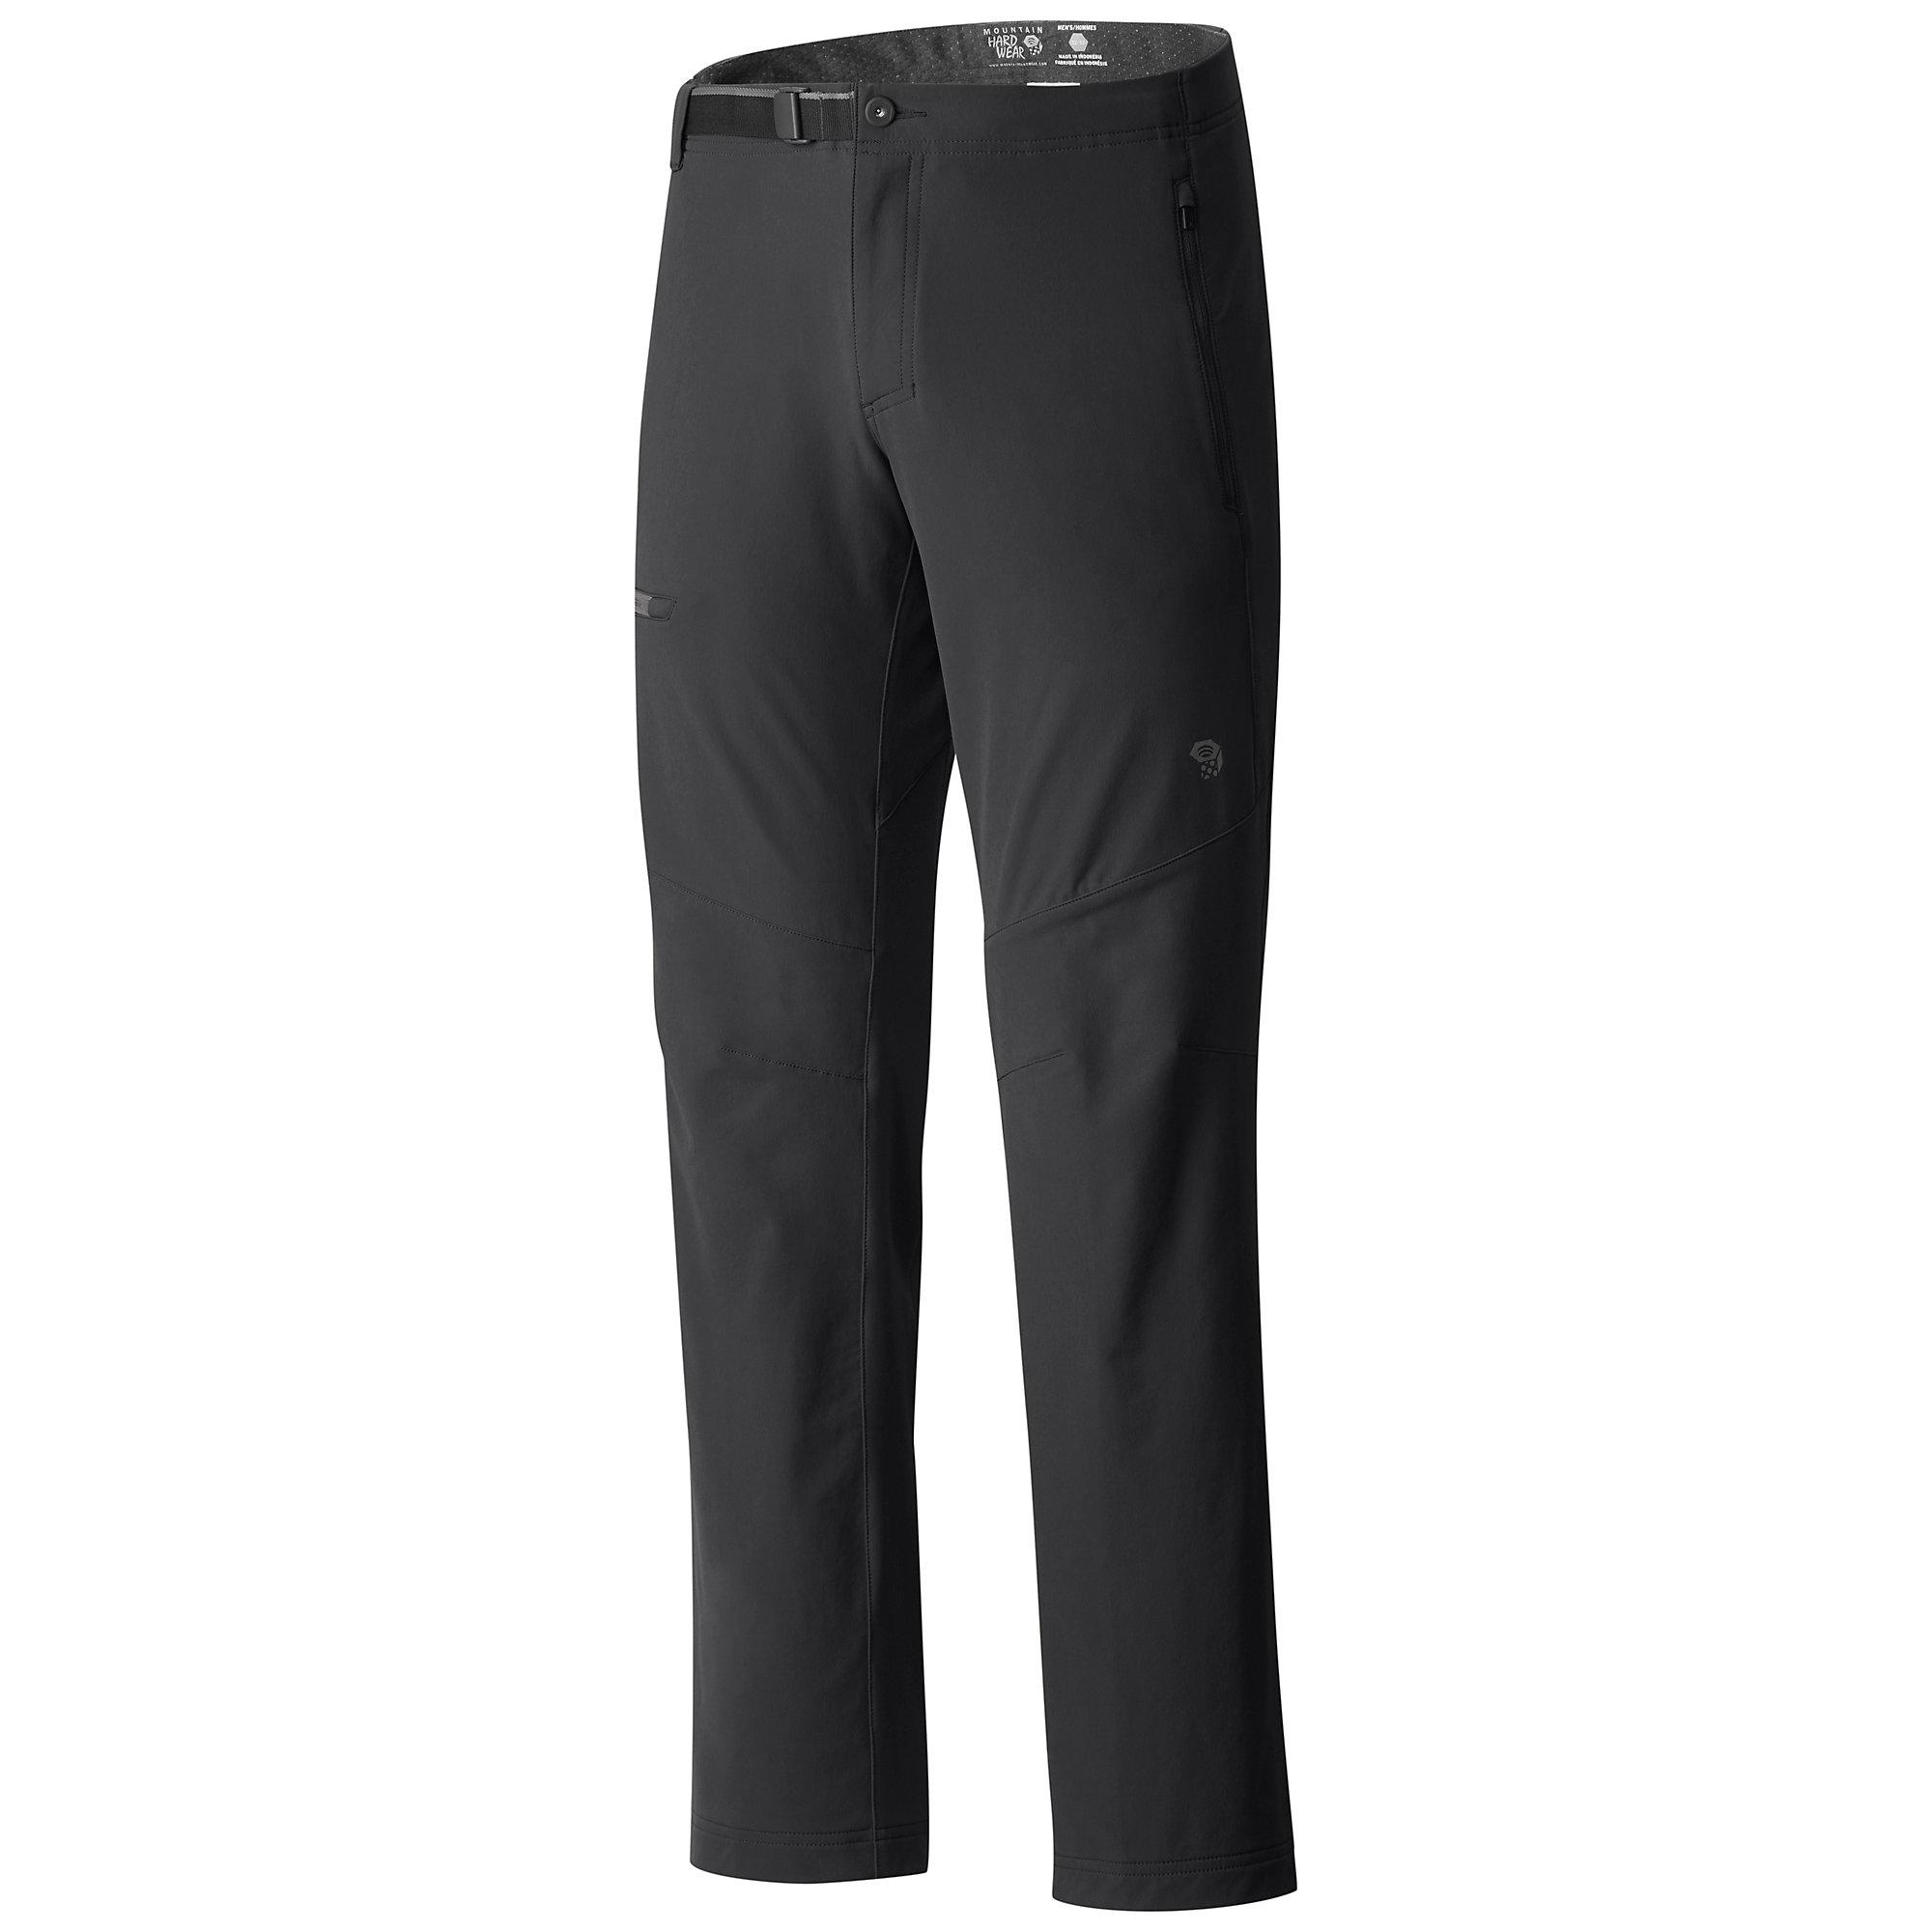 Mountain Hardwear Chockstone Midweight Active Pant